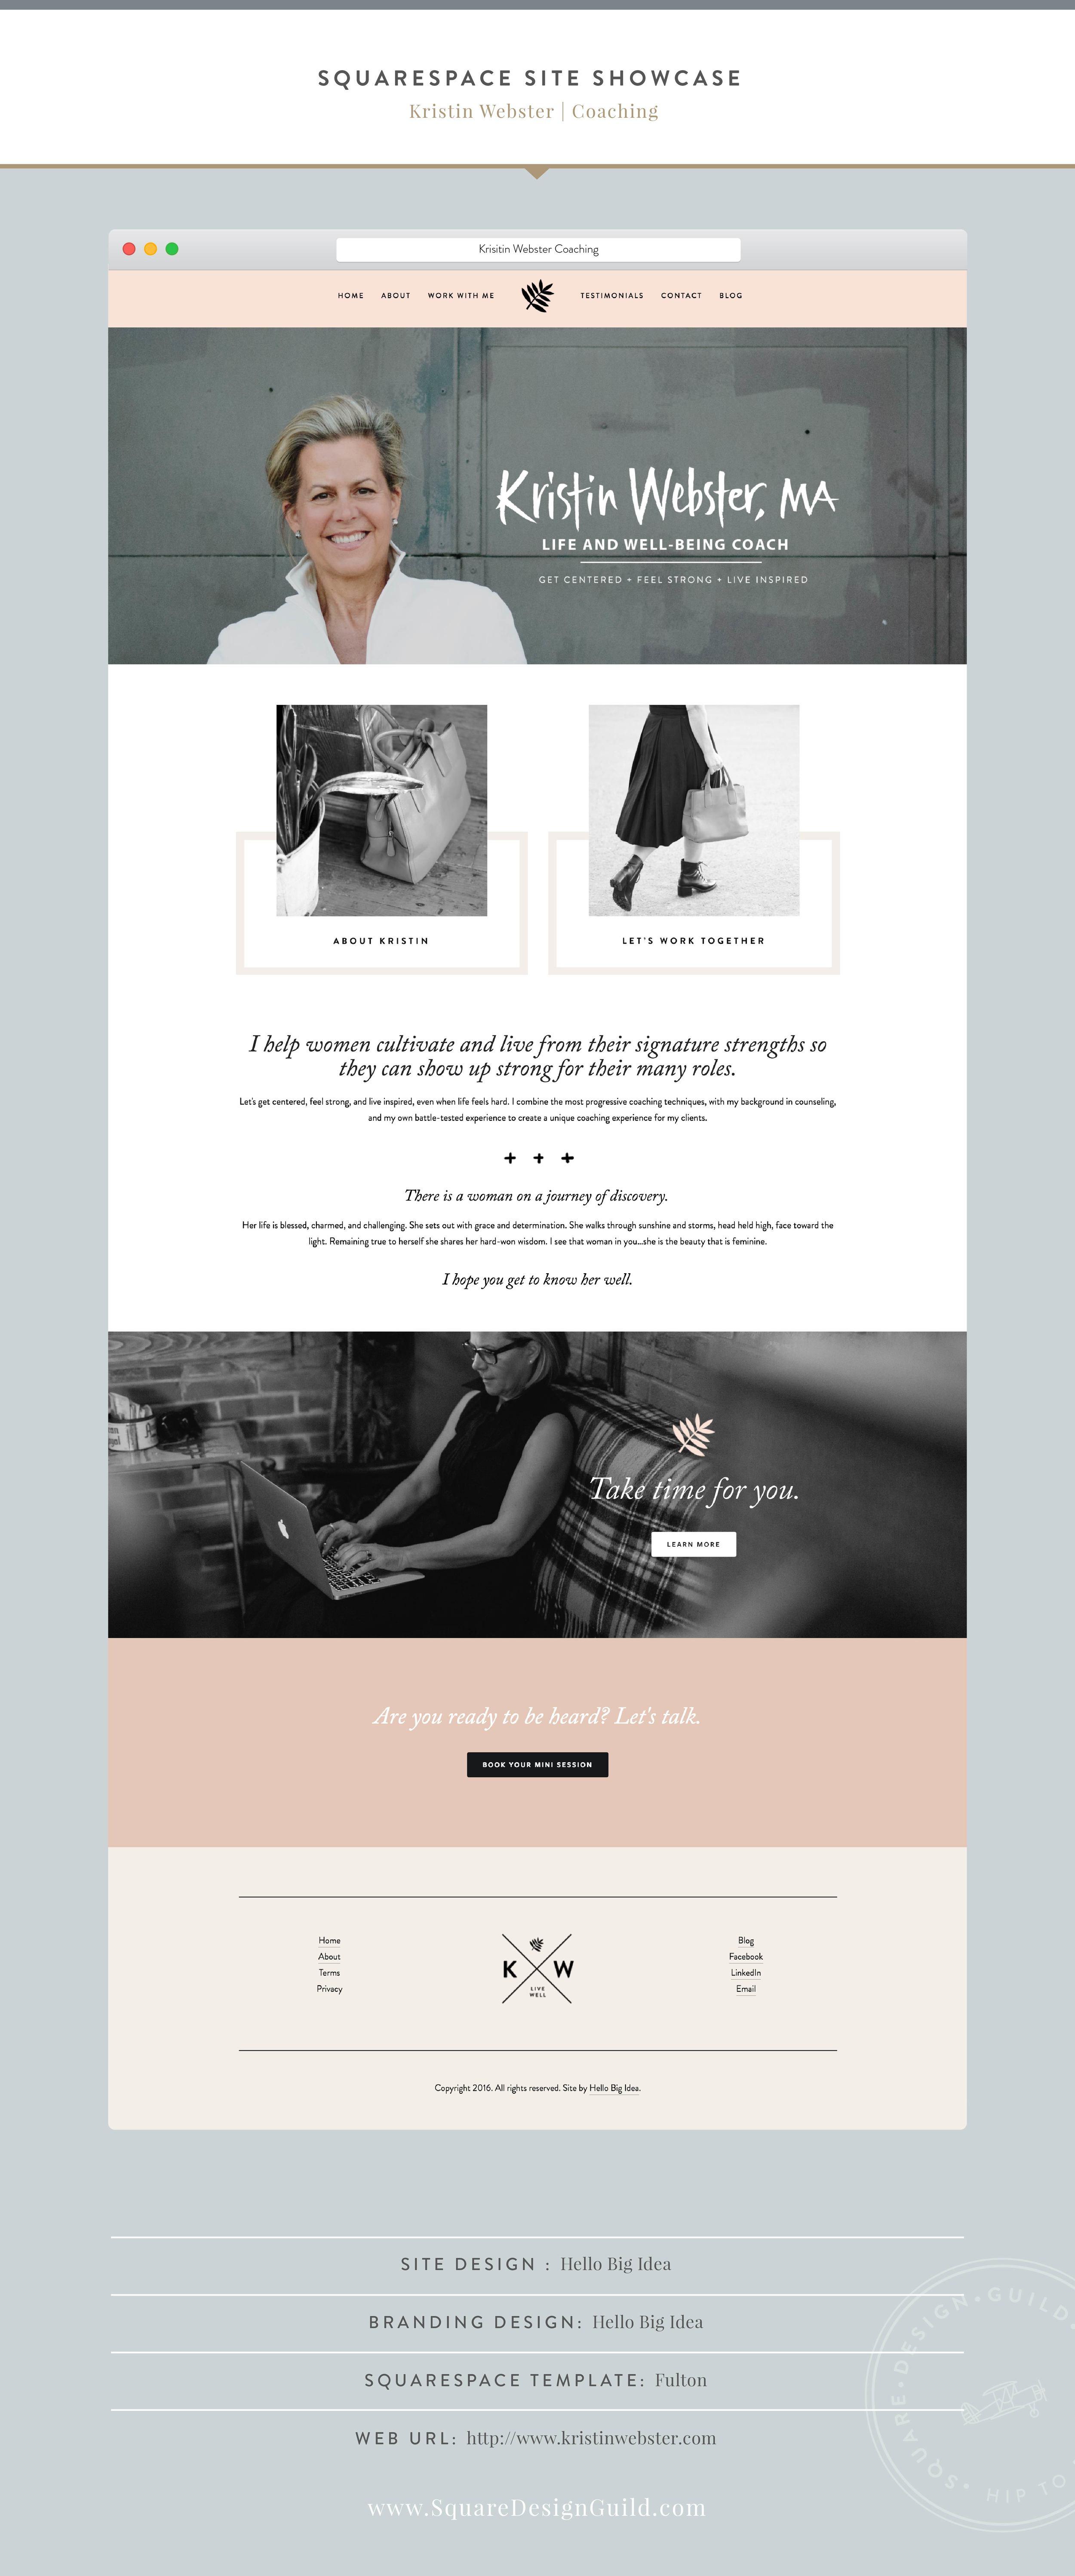 Squarespace Design Guild | Squarespace Site Showcase | Designed by Hello Big Idea for Kristin Webster Coaching | Fulton Template